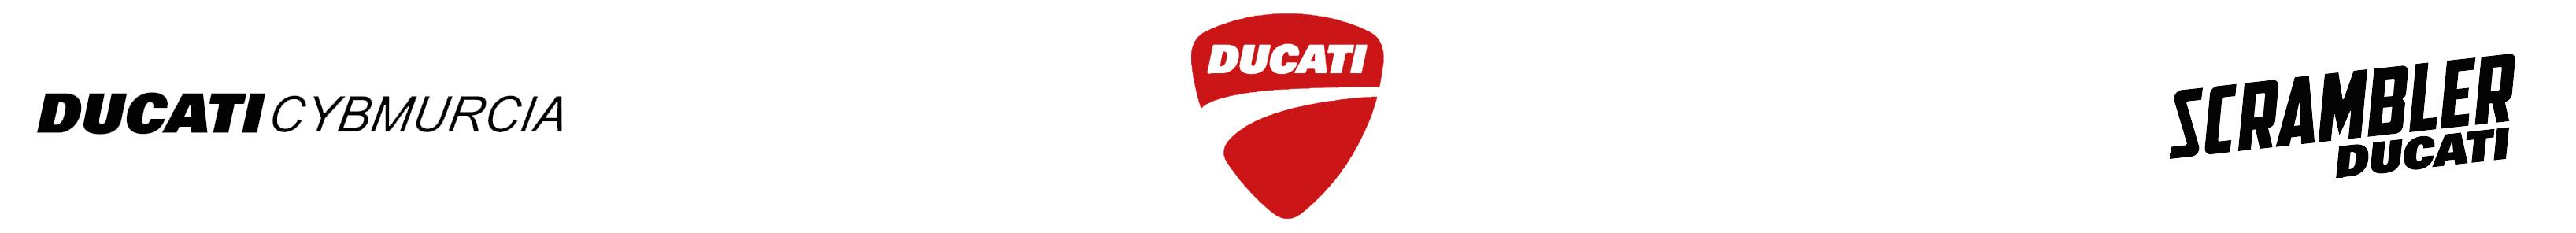 DucaticybMurcia